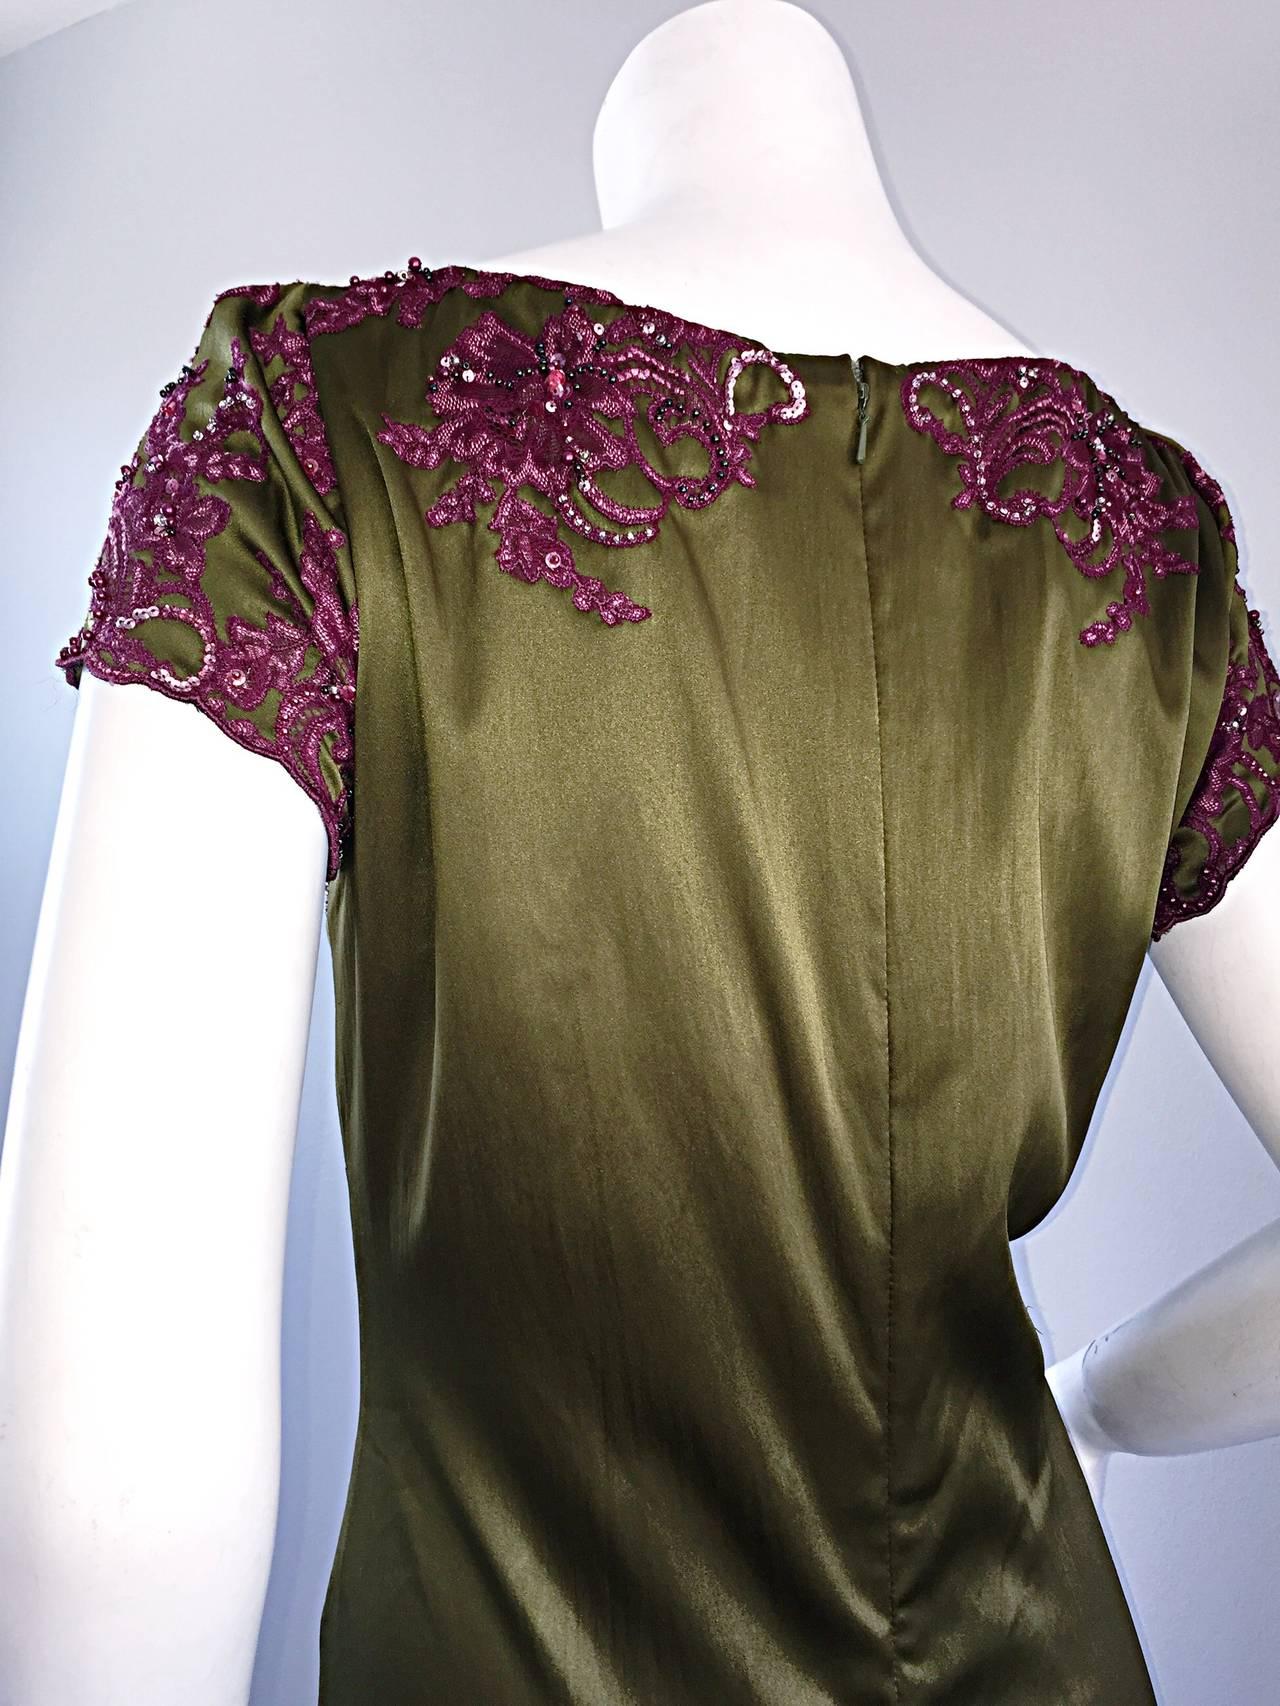 Beautiful Mandalay Chartreuse Merlot Sz 6 Silk Bombshell Dress w/ Beading & Lace For Sale 3